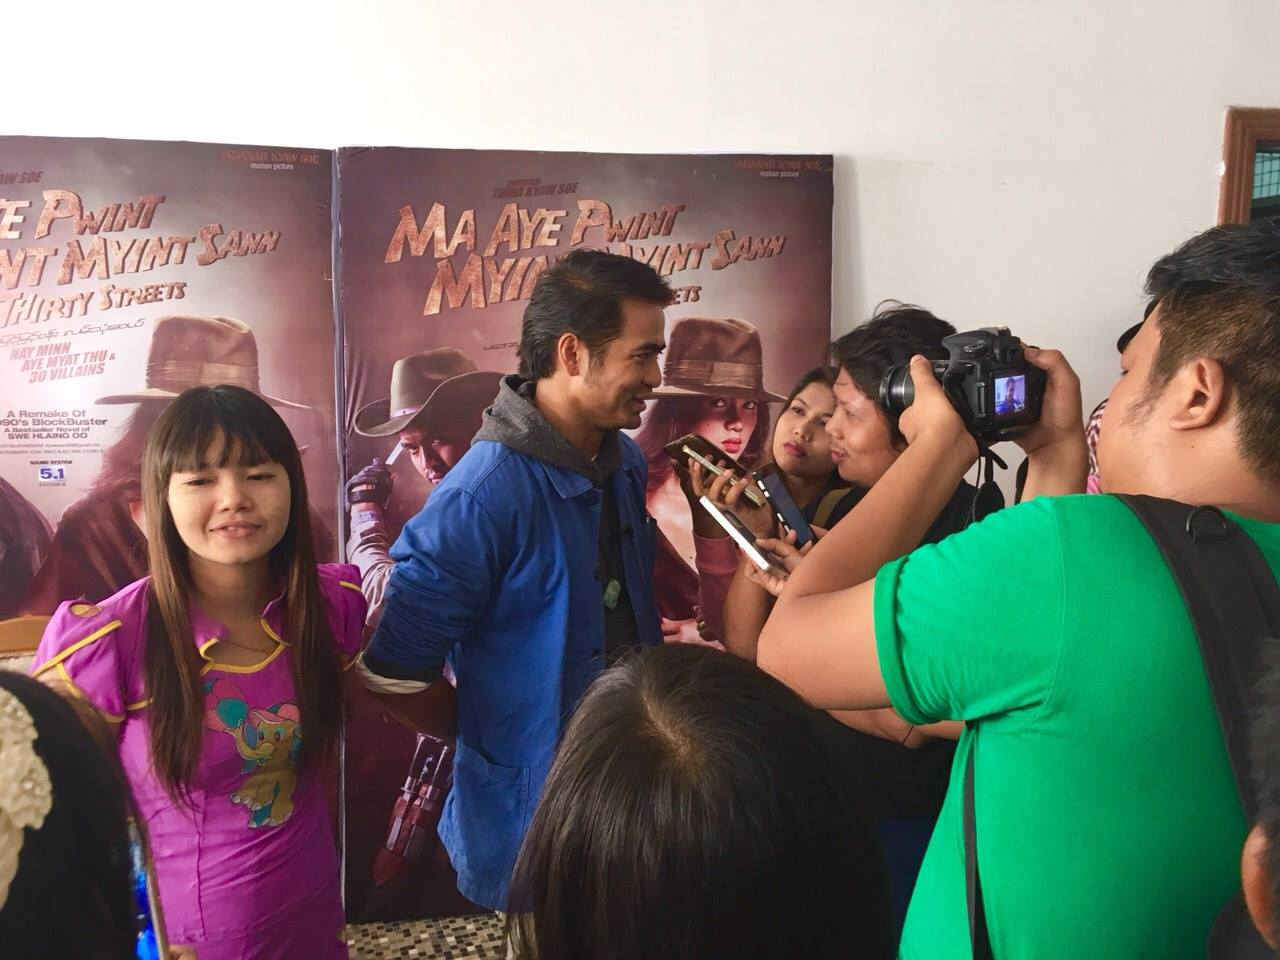 Ma Aye Pwint Myint Myint Sann Thirty Streets Premiere Show